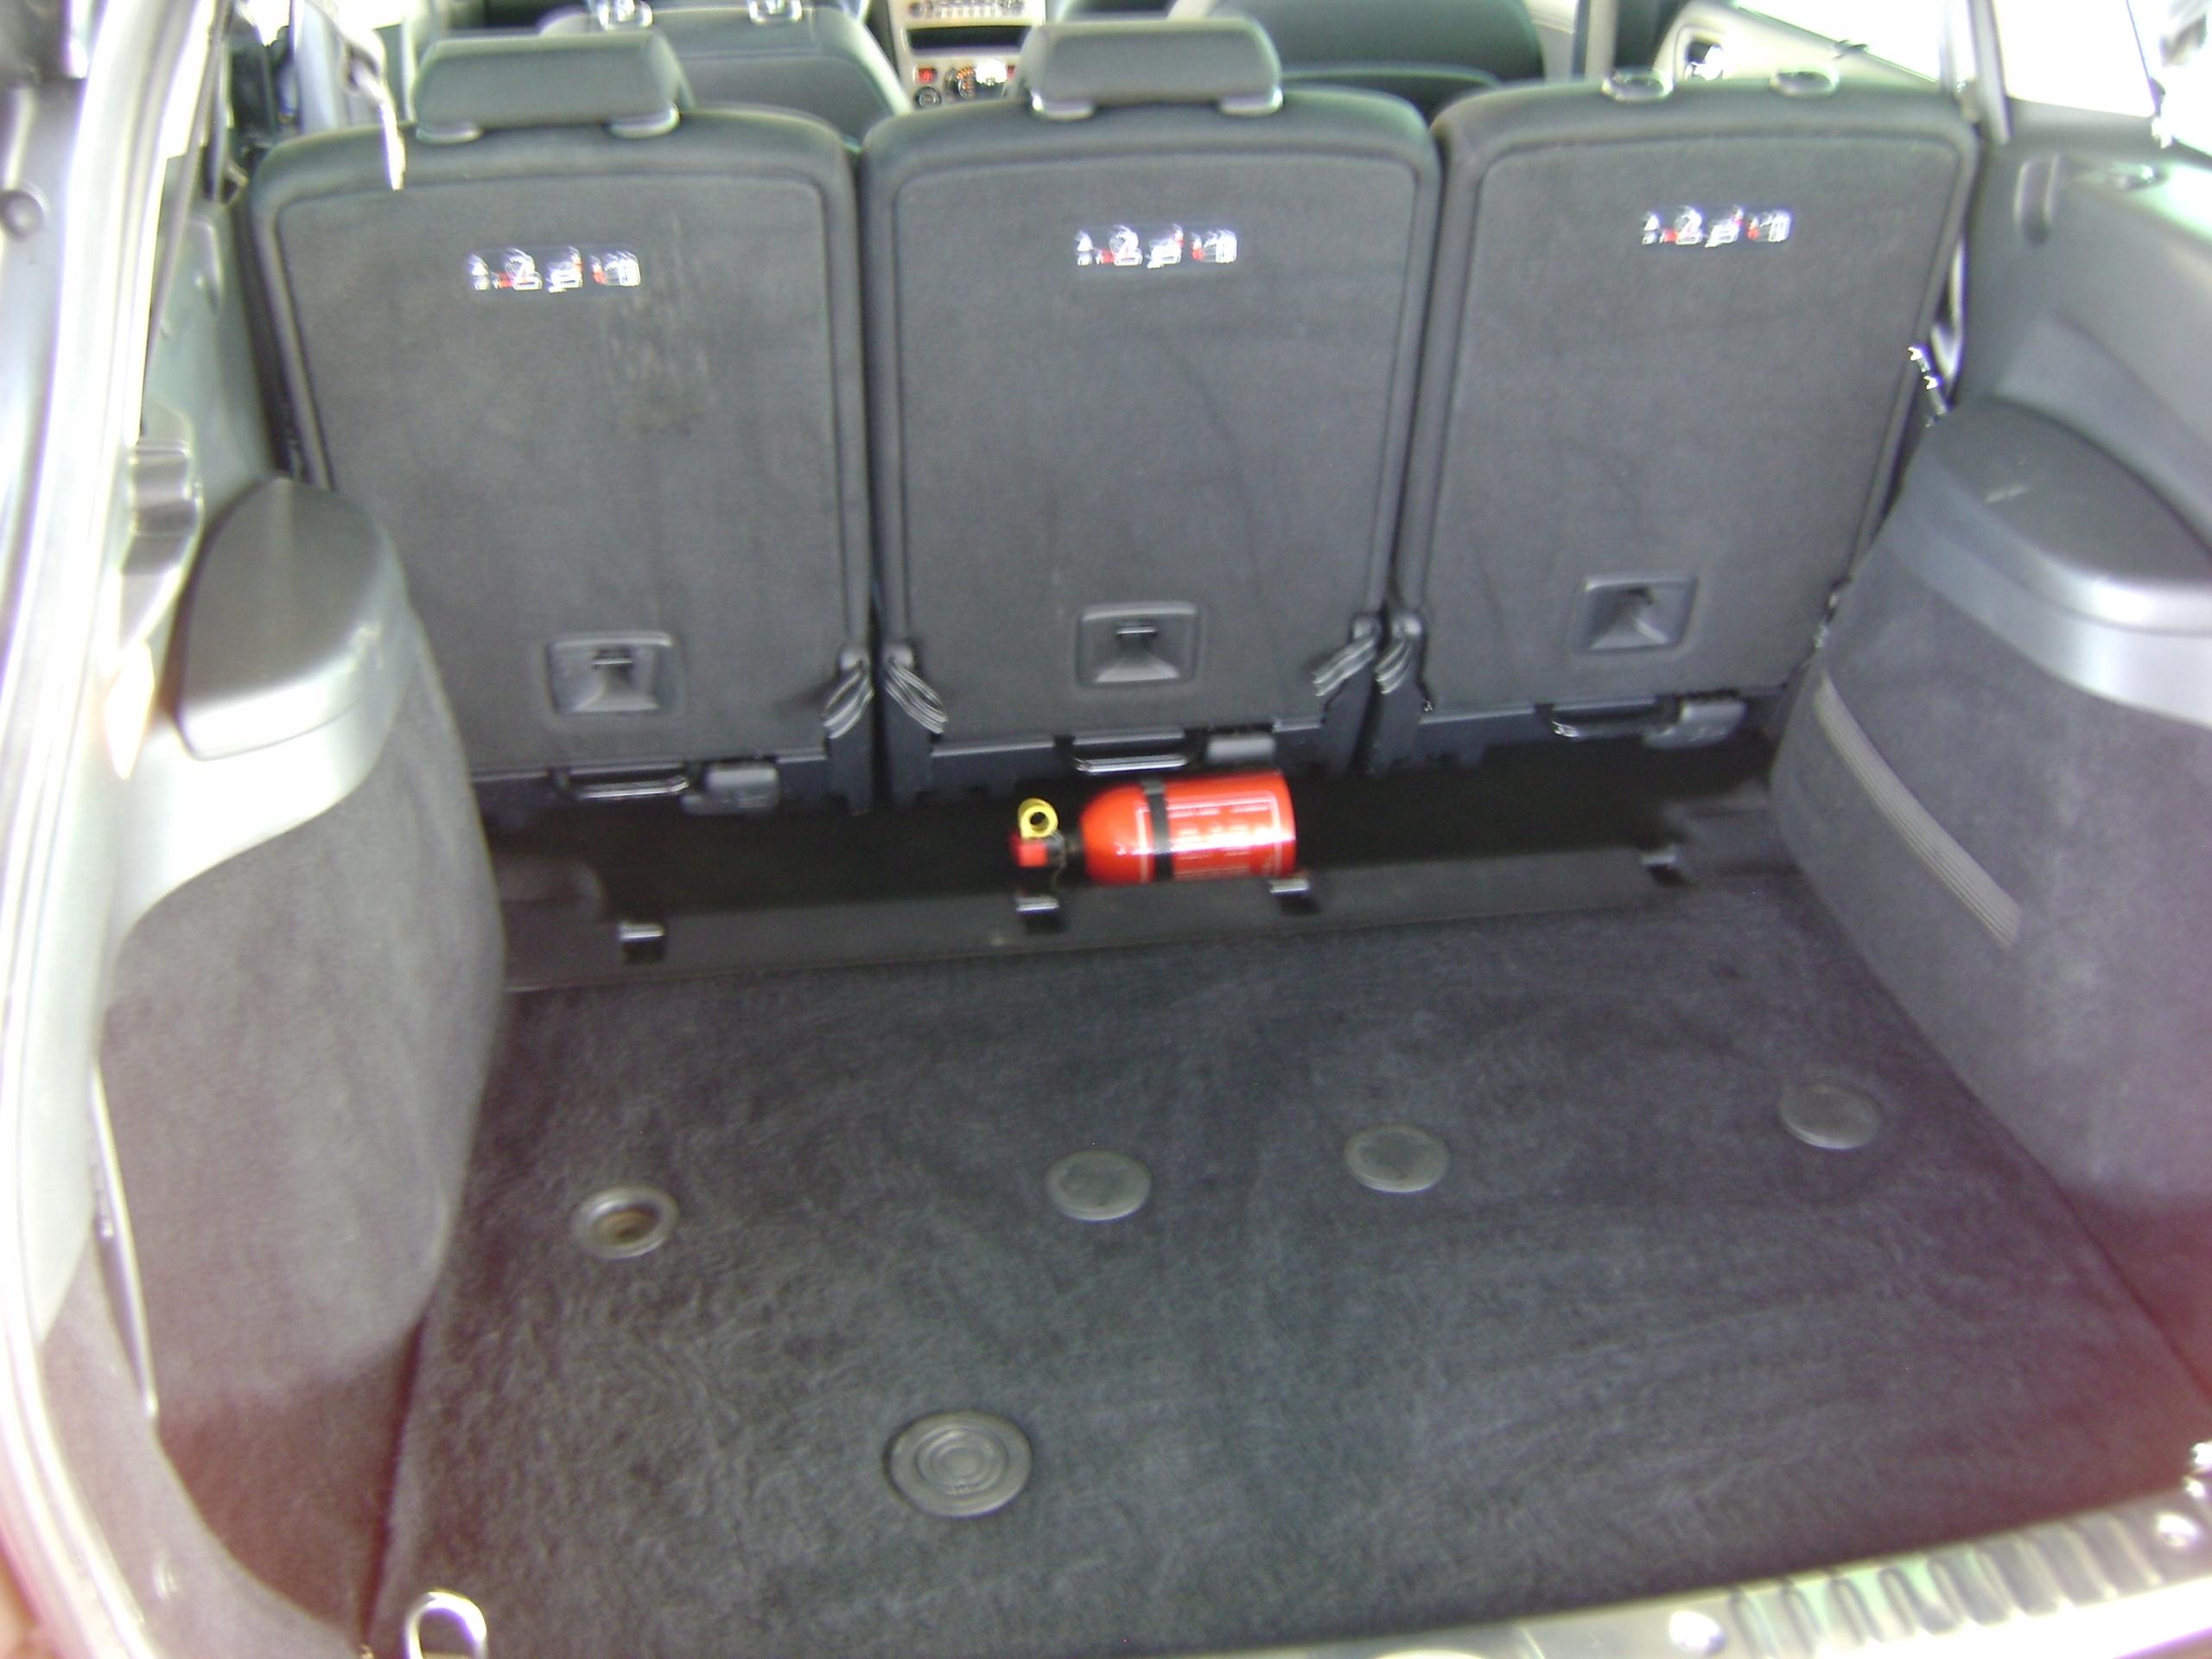 W Ultra Peugeot 308 sw 156 km automat 7 osobowy panorama - 7666557335 YY55